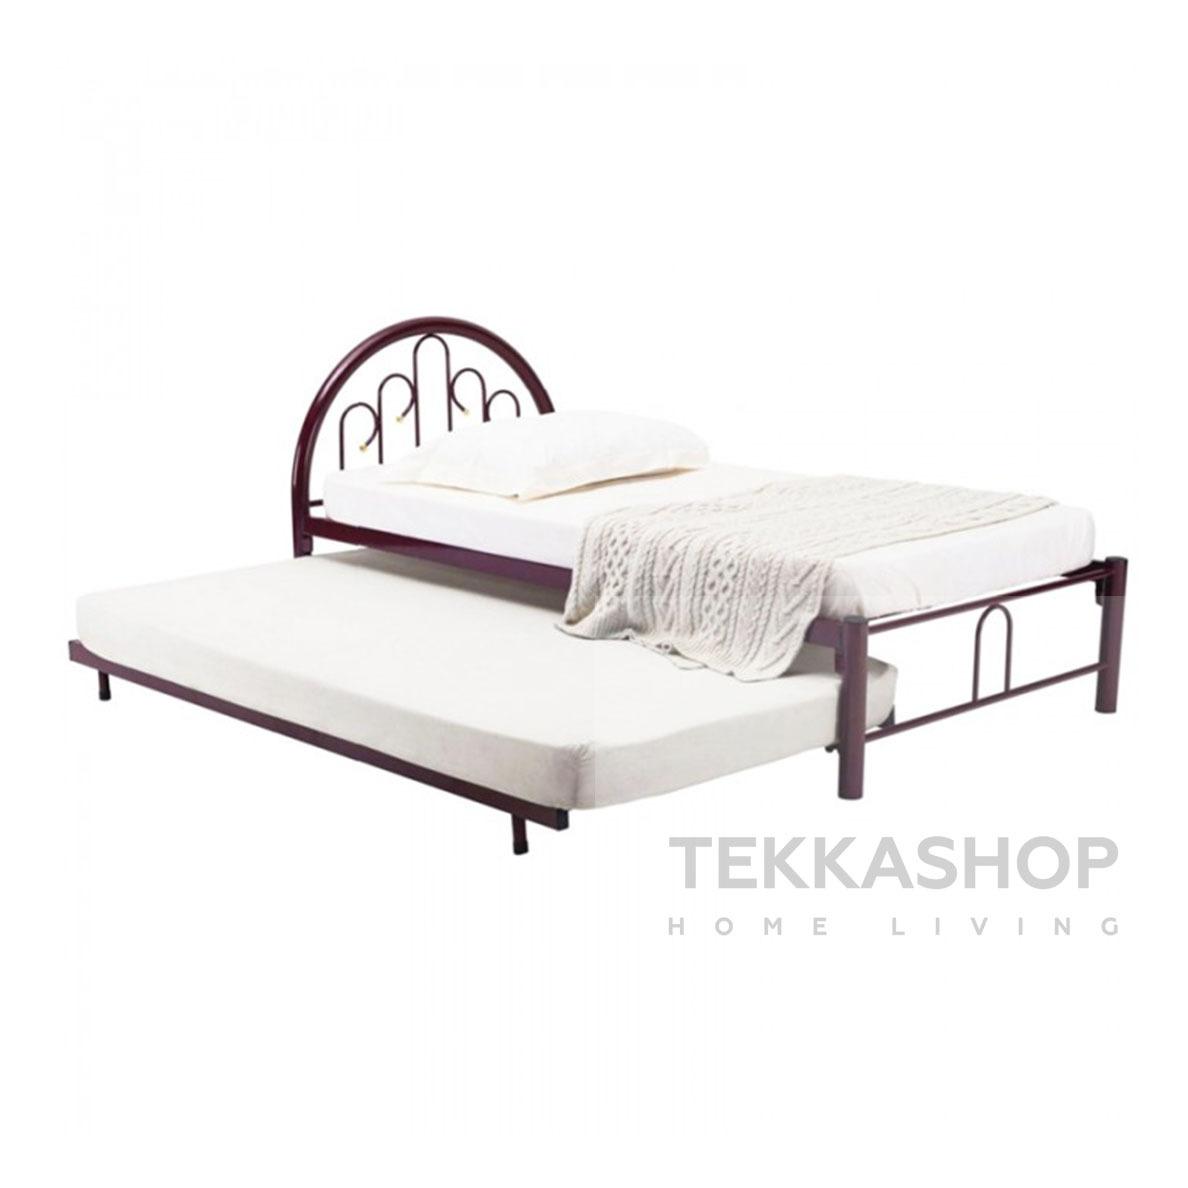 Tekkashop GDSBF2538R Single Metal B (end 4/20/2021 12:00 AM)